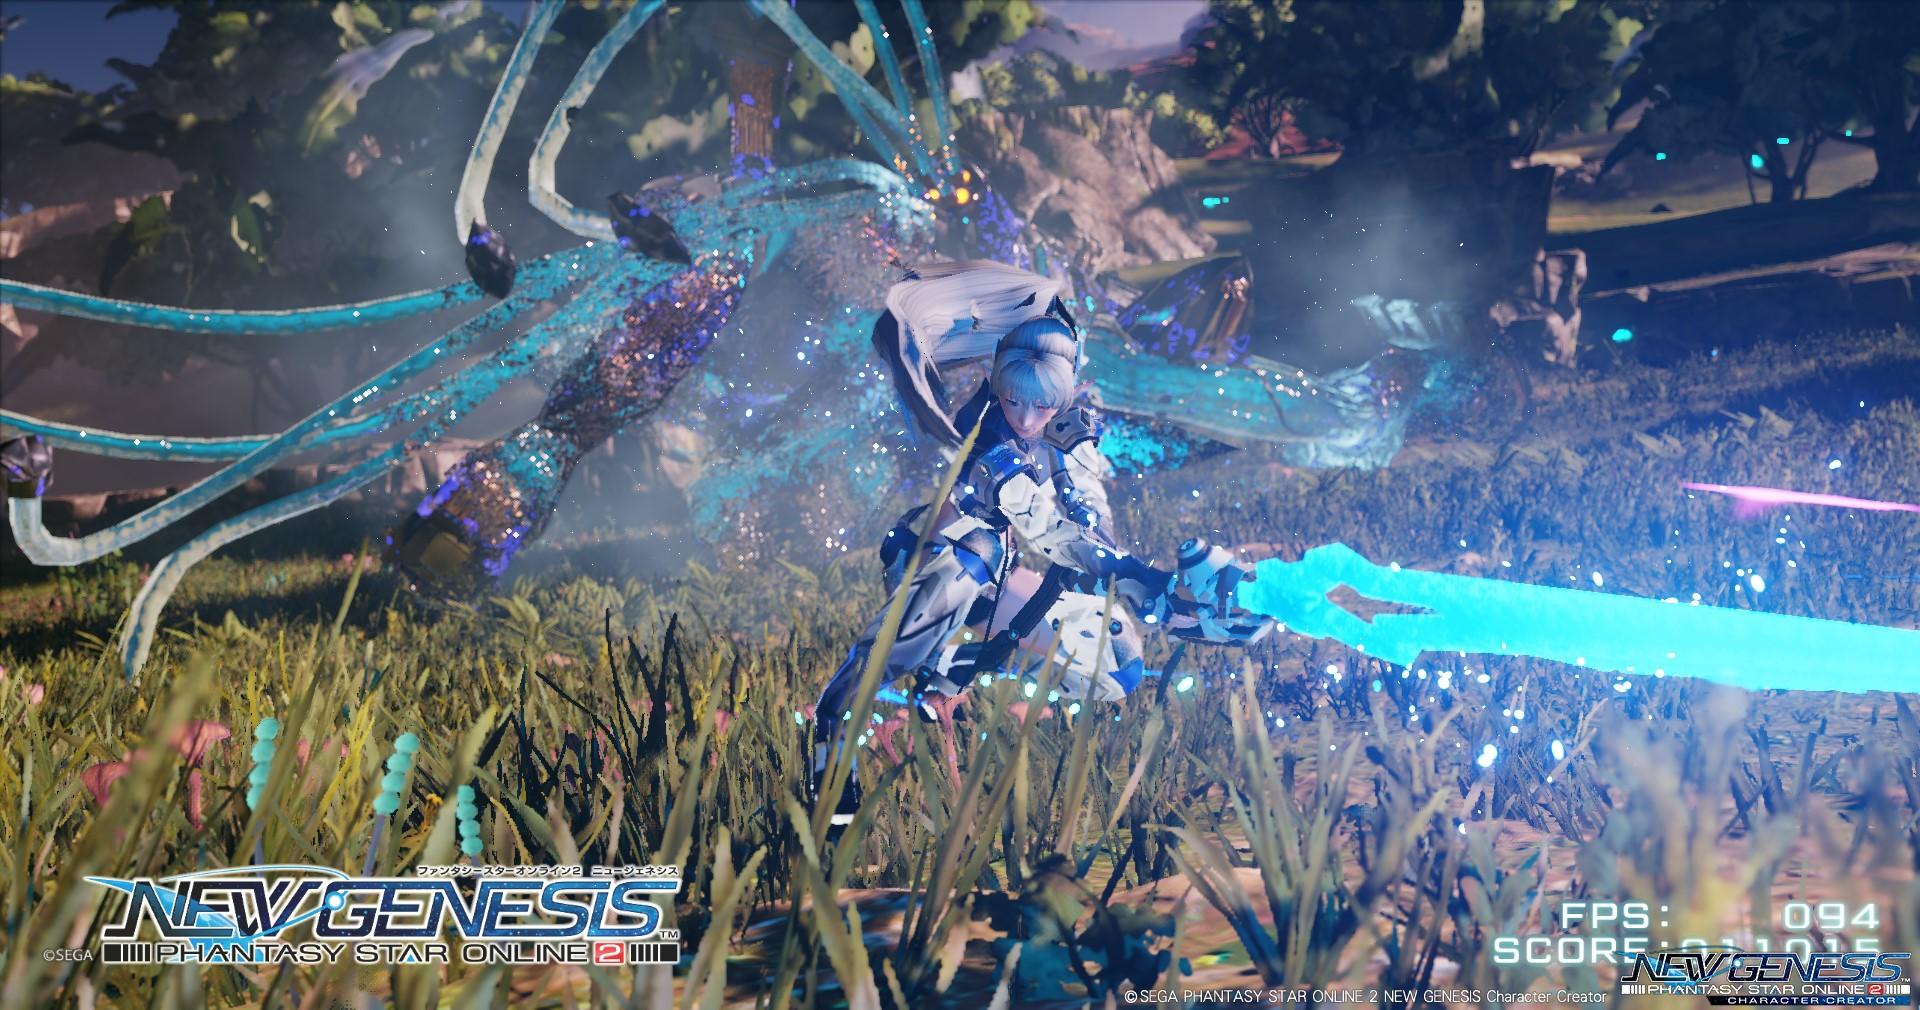 Phantasy Star Online 2 New Genesis 服務開放日子確定!